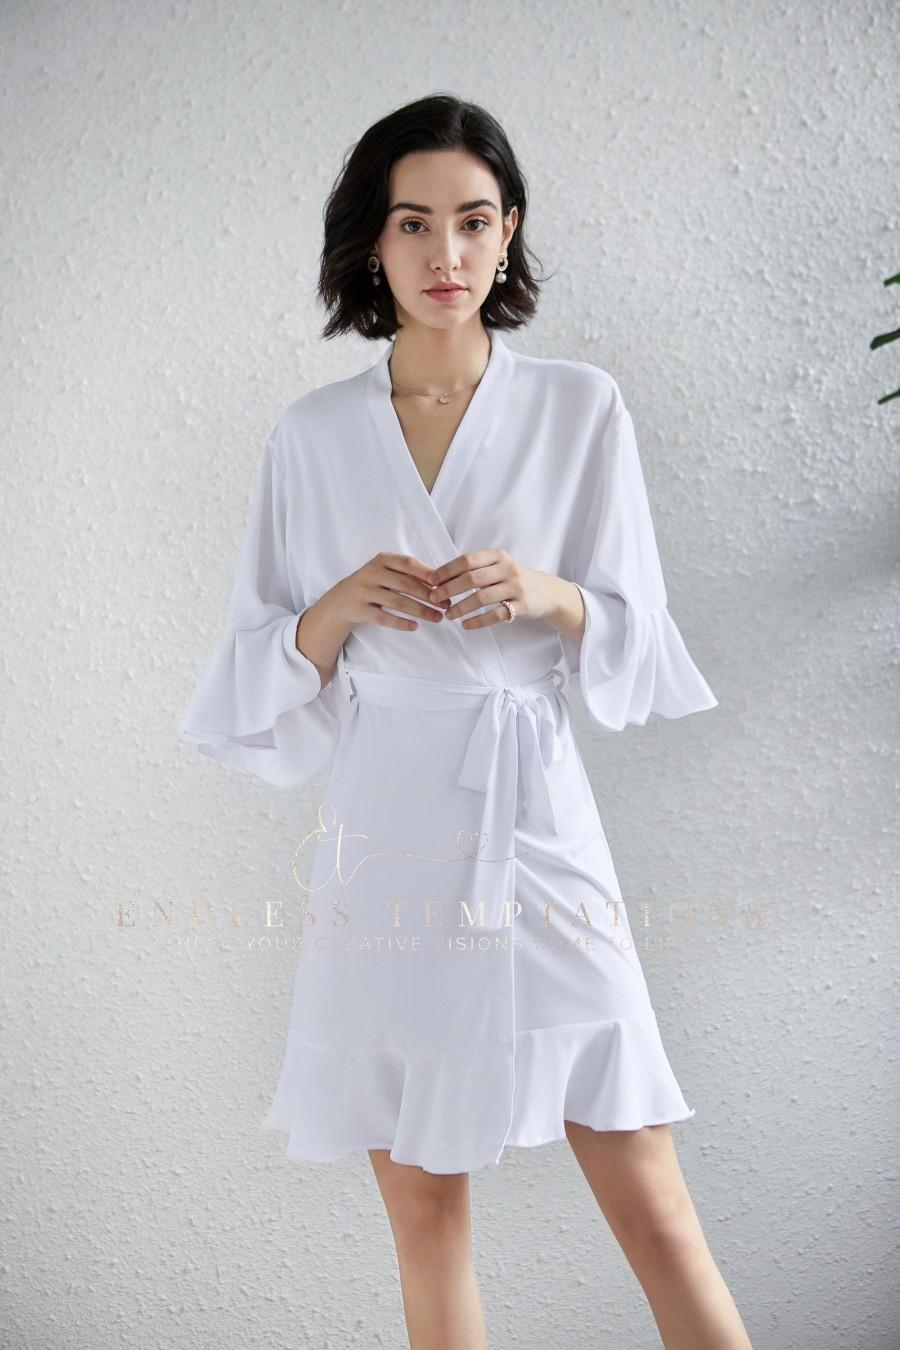 Wedding - PLAIN WHITE Ruffle Lace Robe, Bridesmaid Gifts, Chiffon, Robes, Lace Robes, Bridal Robe, Satin Robes, Flower Girl Robes, Bride Robe, Gifts